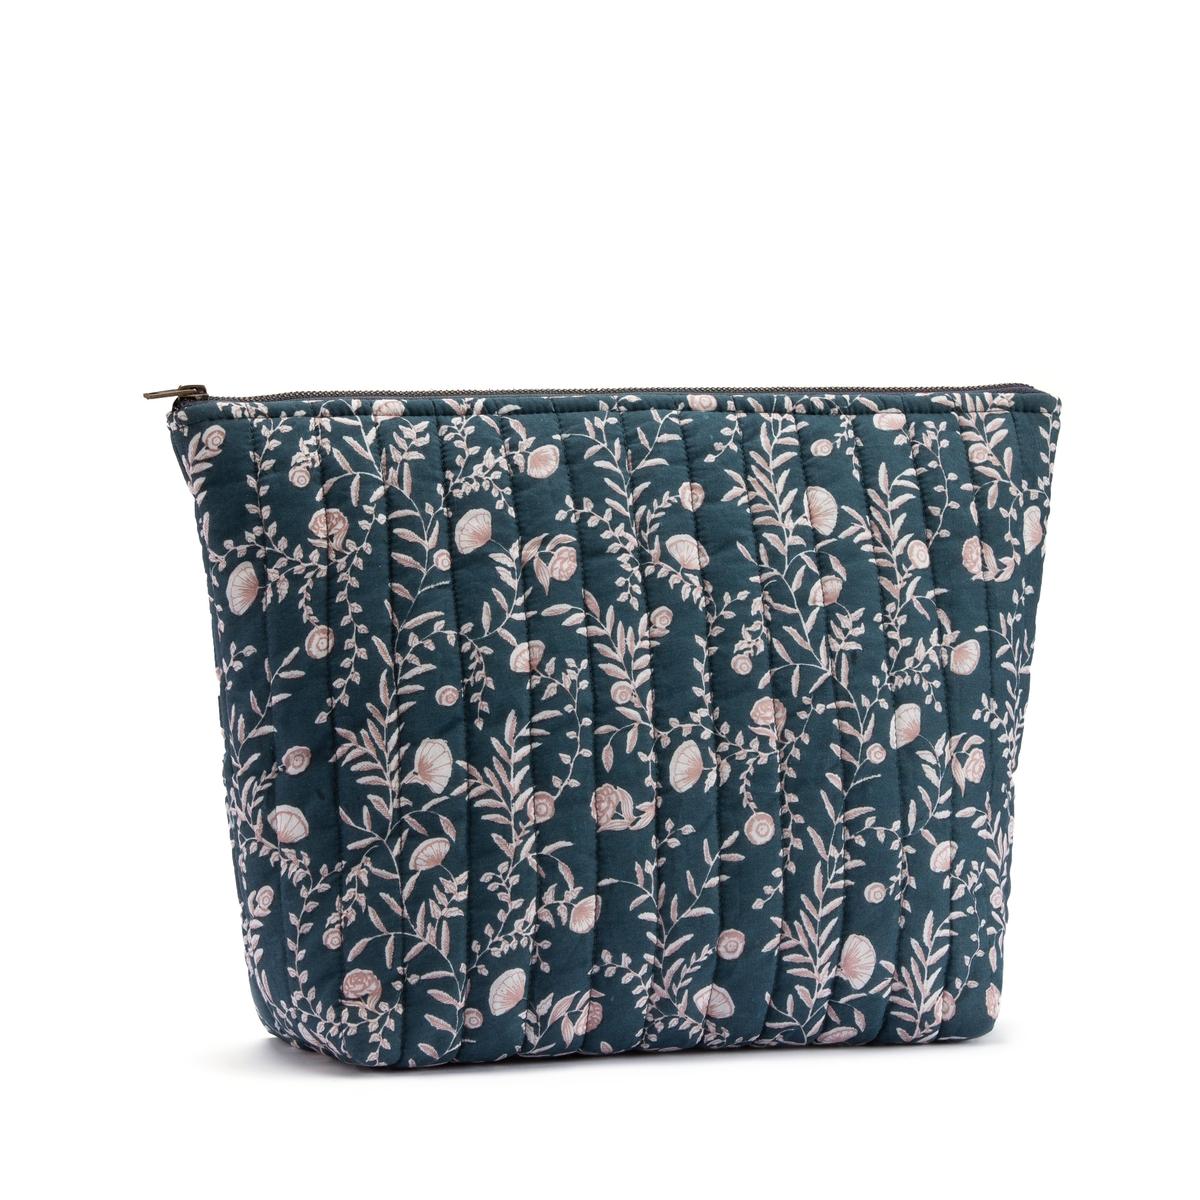 An image of Vimala Cotton Toilet Bag by La Redoute